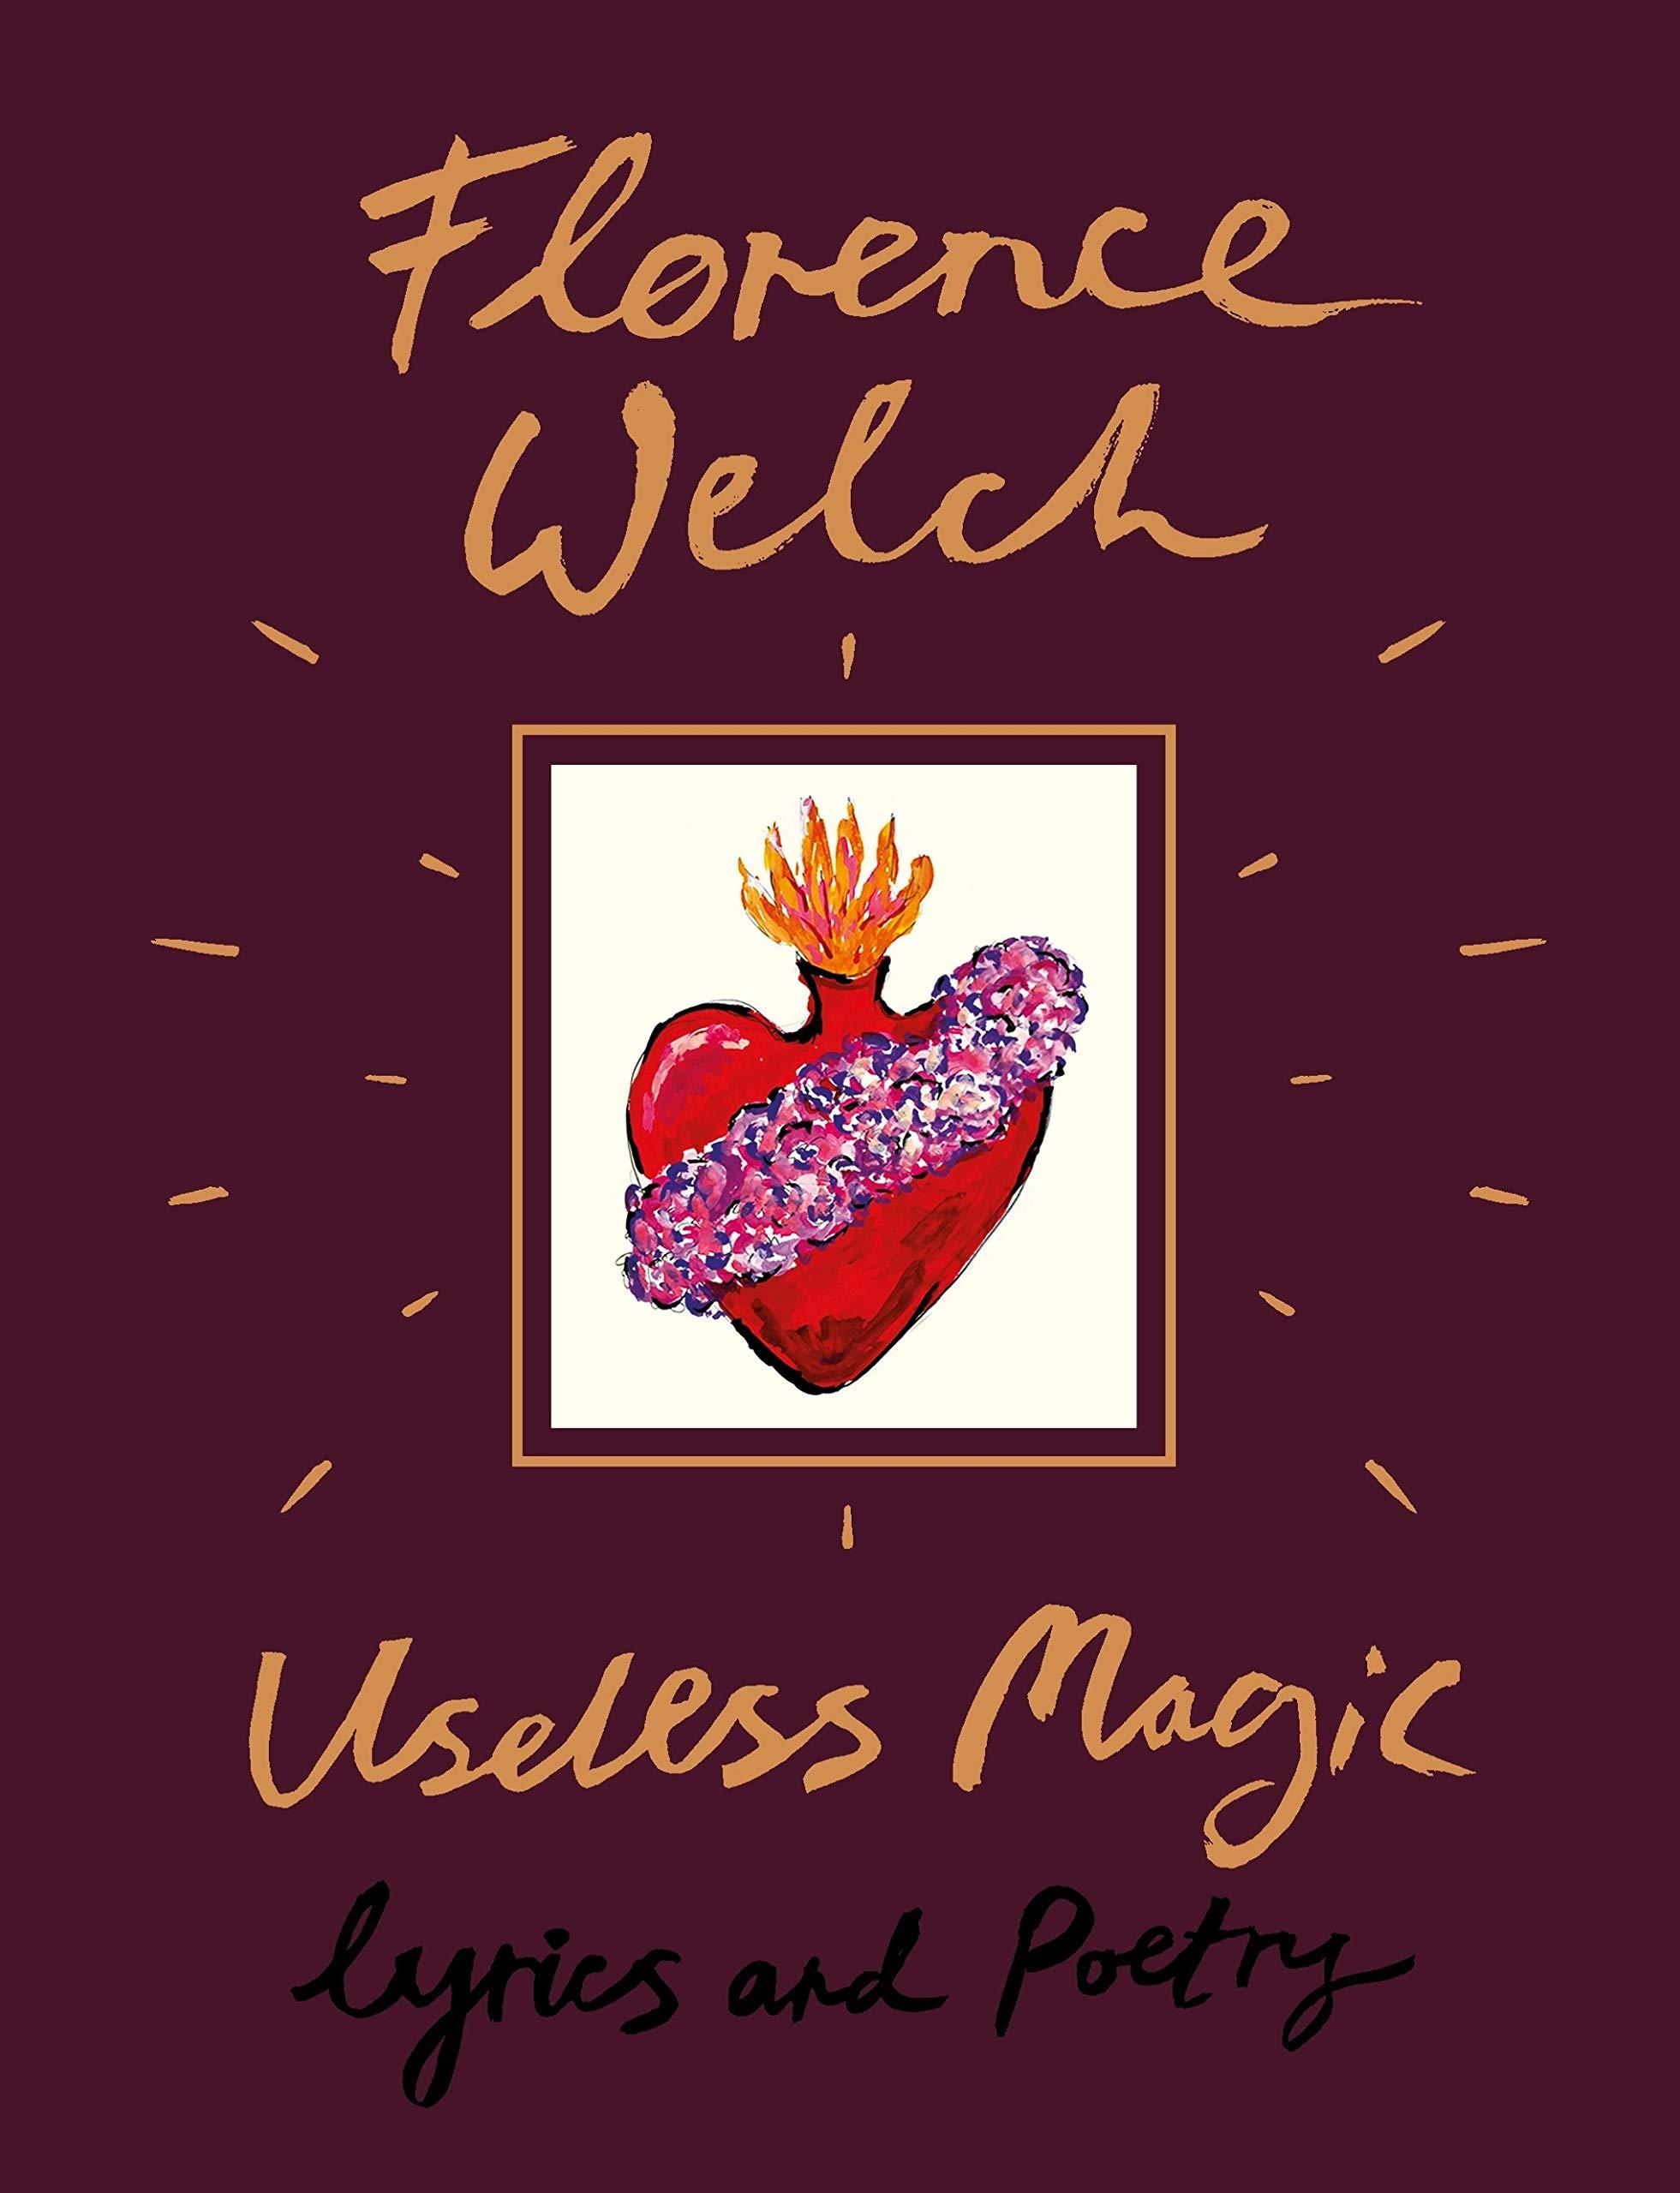 Useless Magic: Lyrics and Poetry: Amazon.de: Florence Welch ...